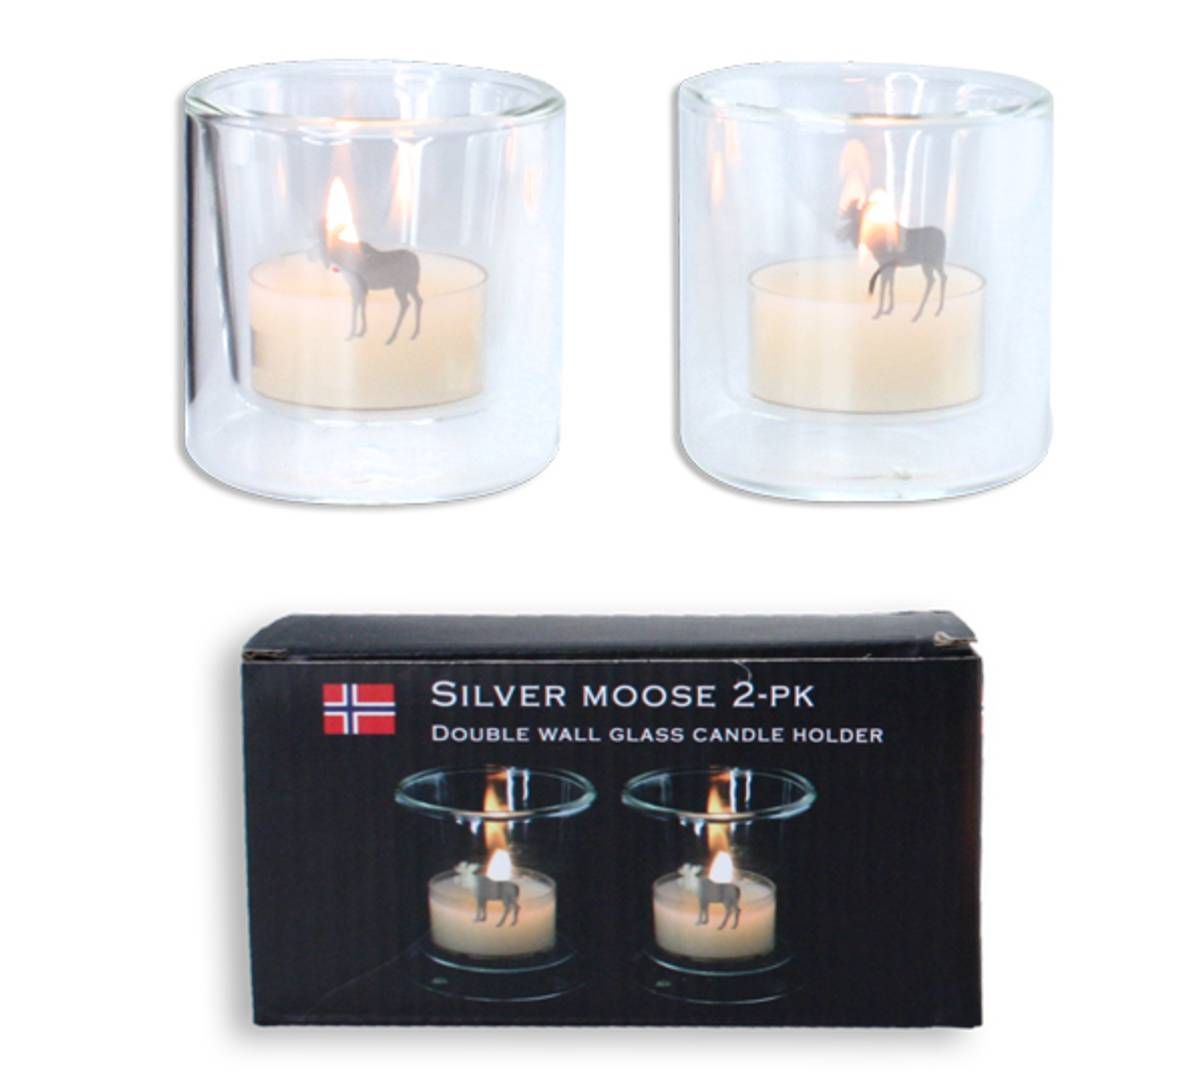 Silver Moose tealight holders